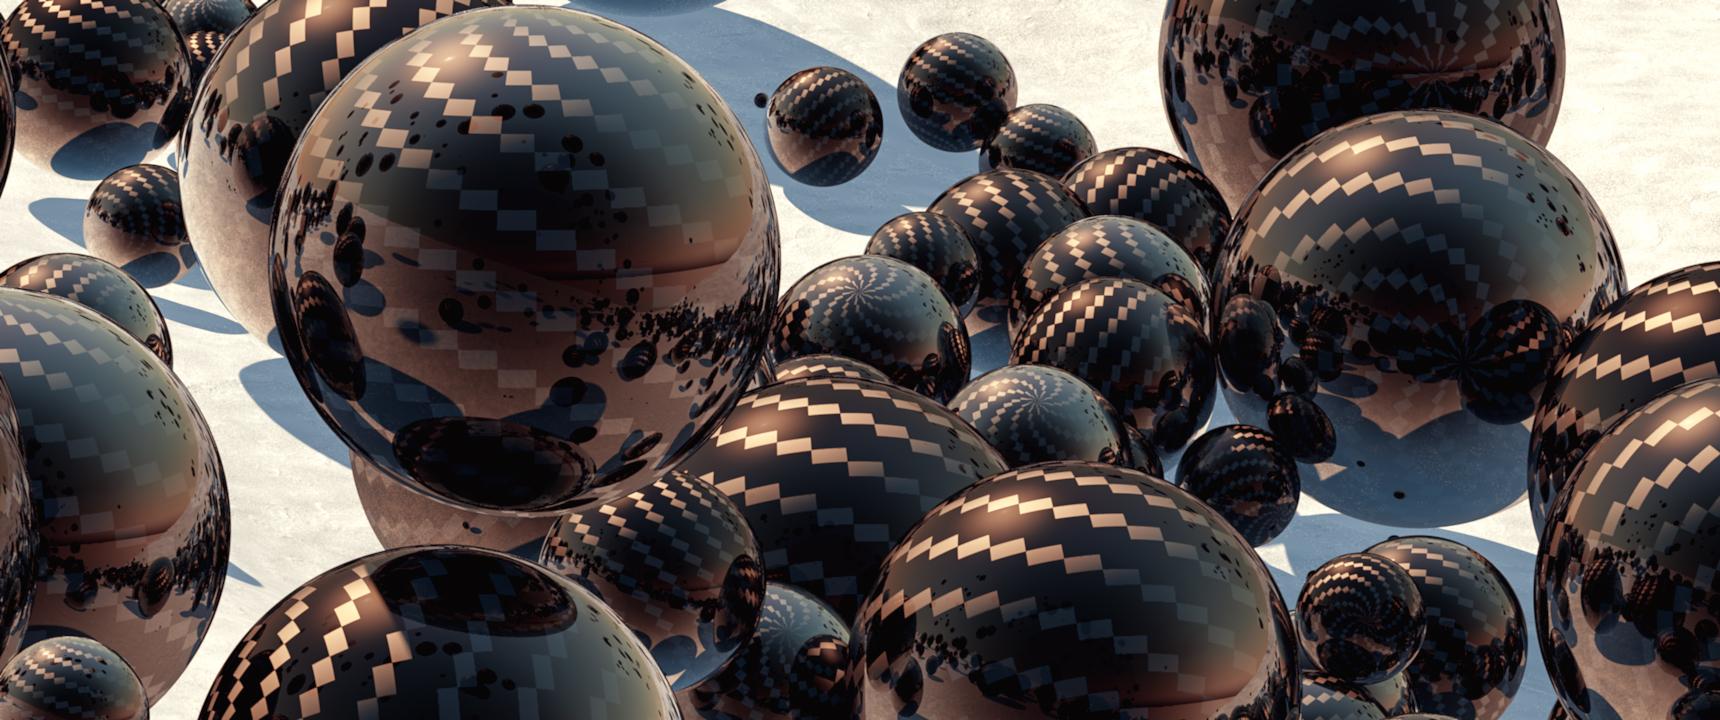 balls-animation-re.jpg